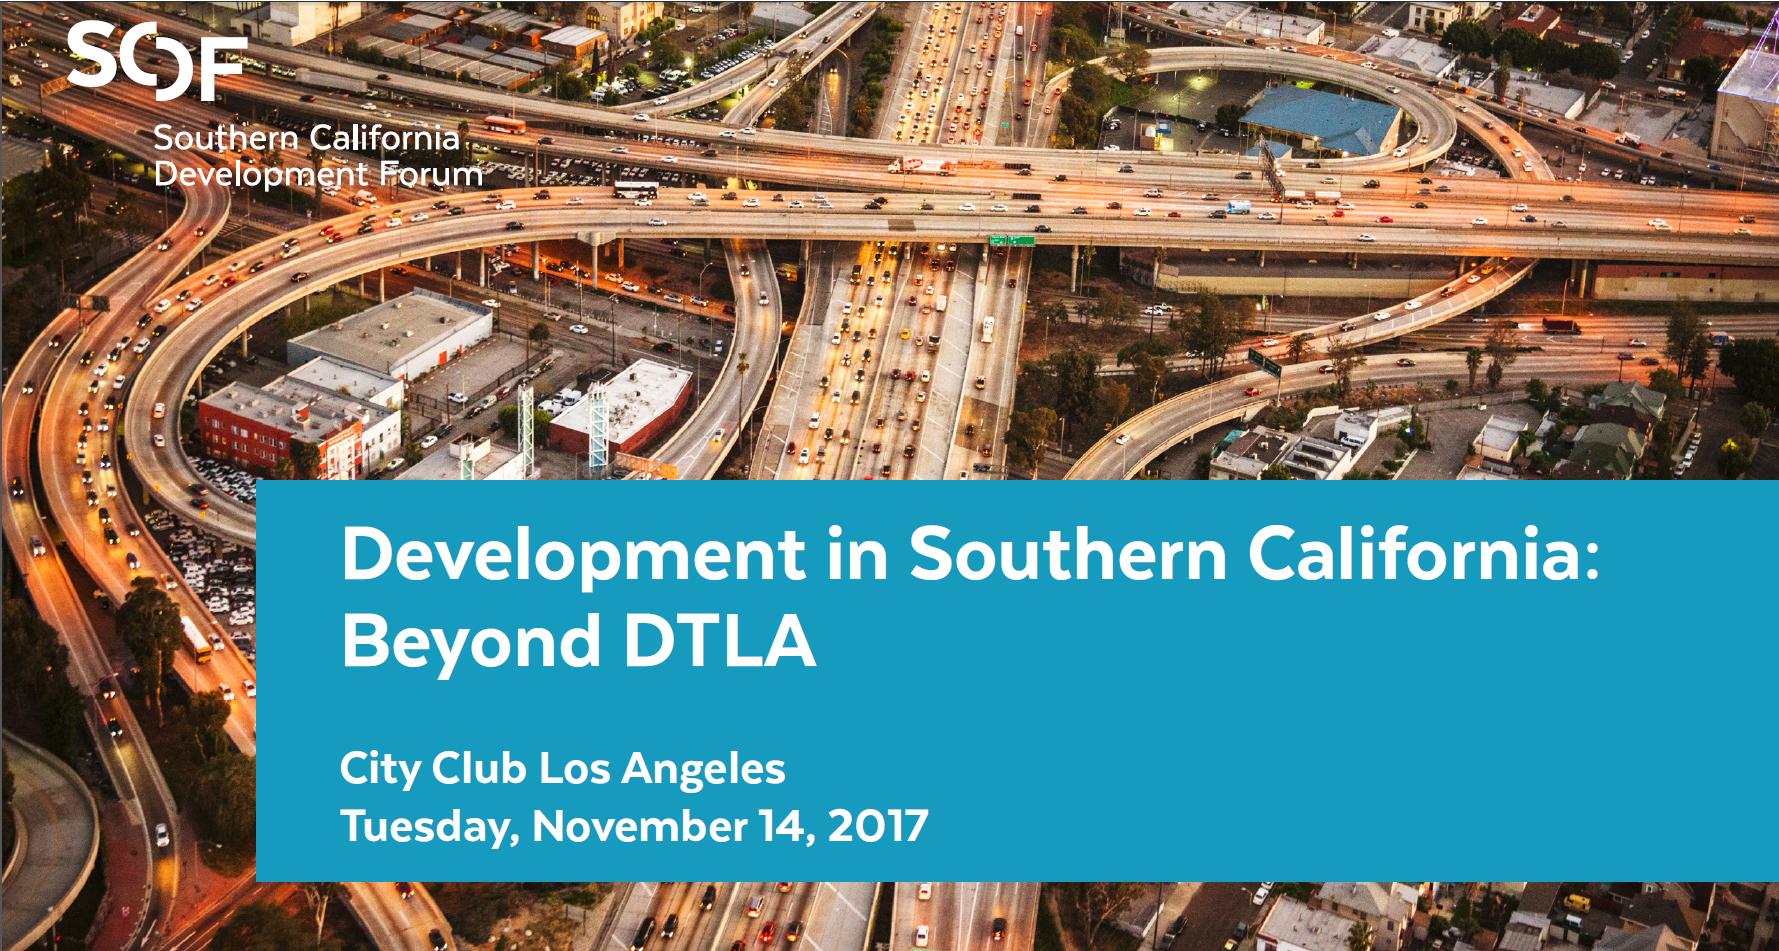 Development in Southern California: Beyond DTLA Tuesday, November 14, 2017